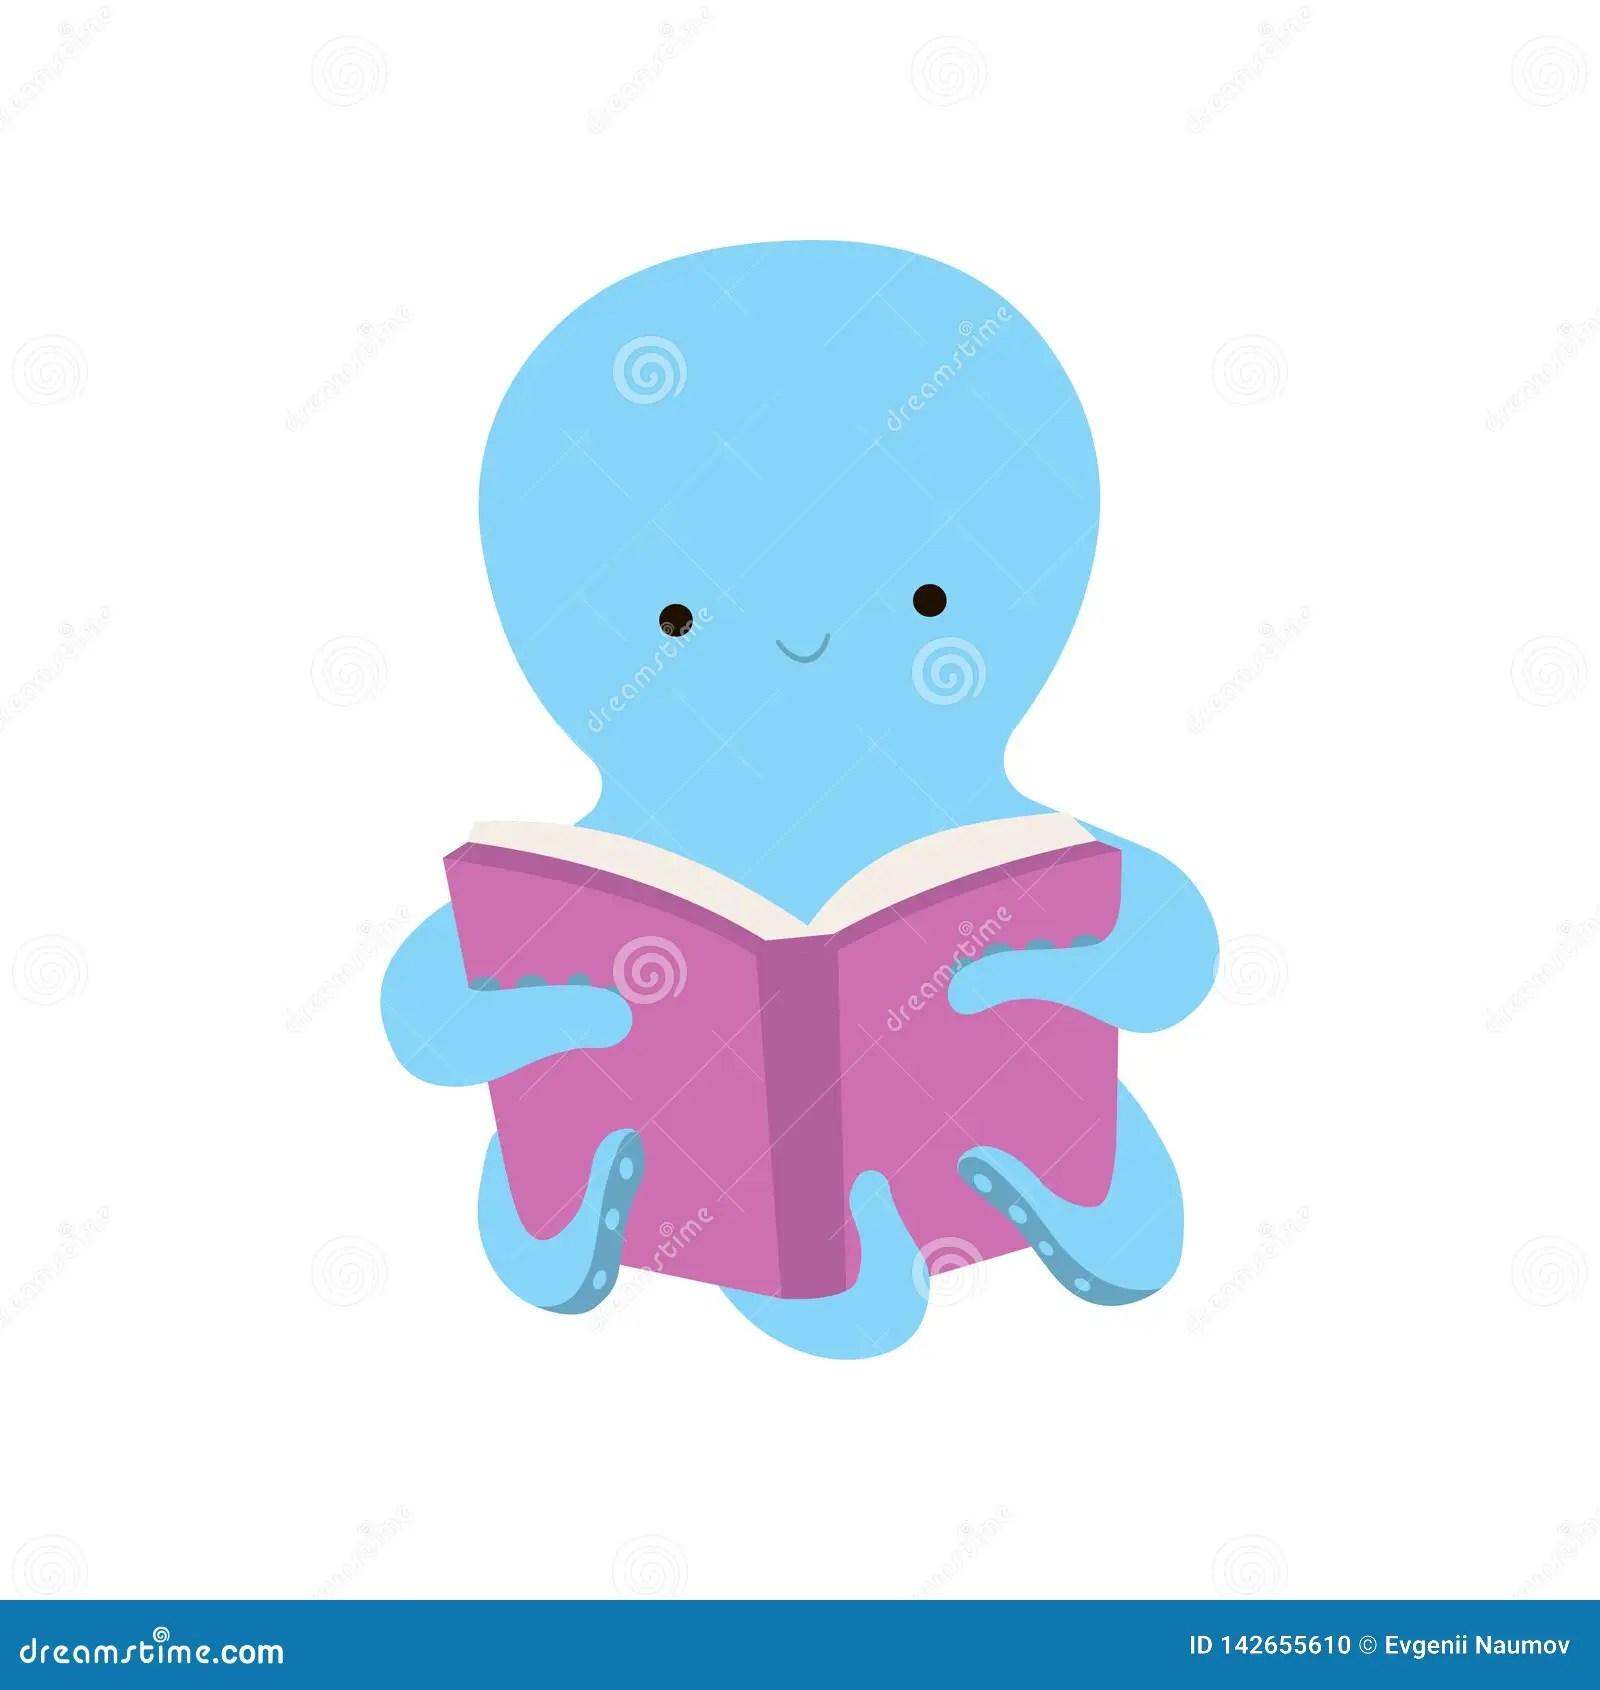 Cute Octopus Reading Book Adorable Smart Sea Creature